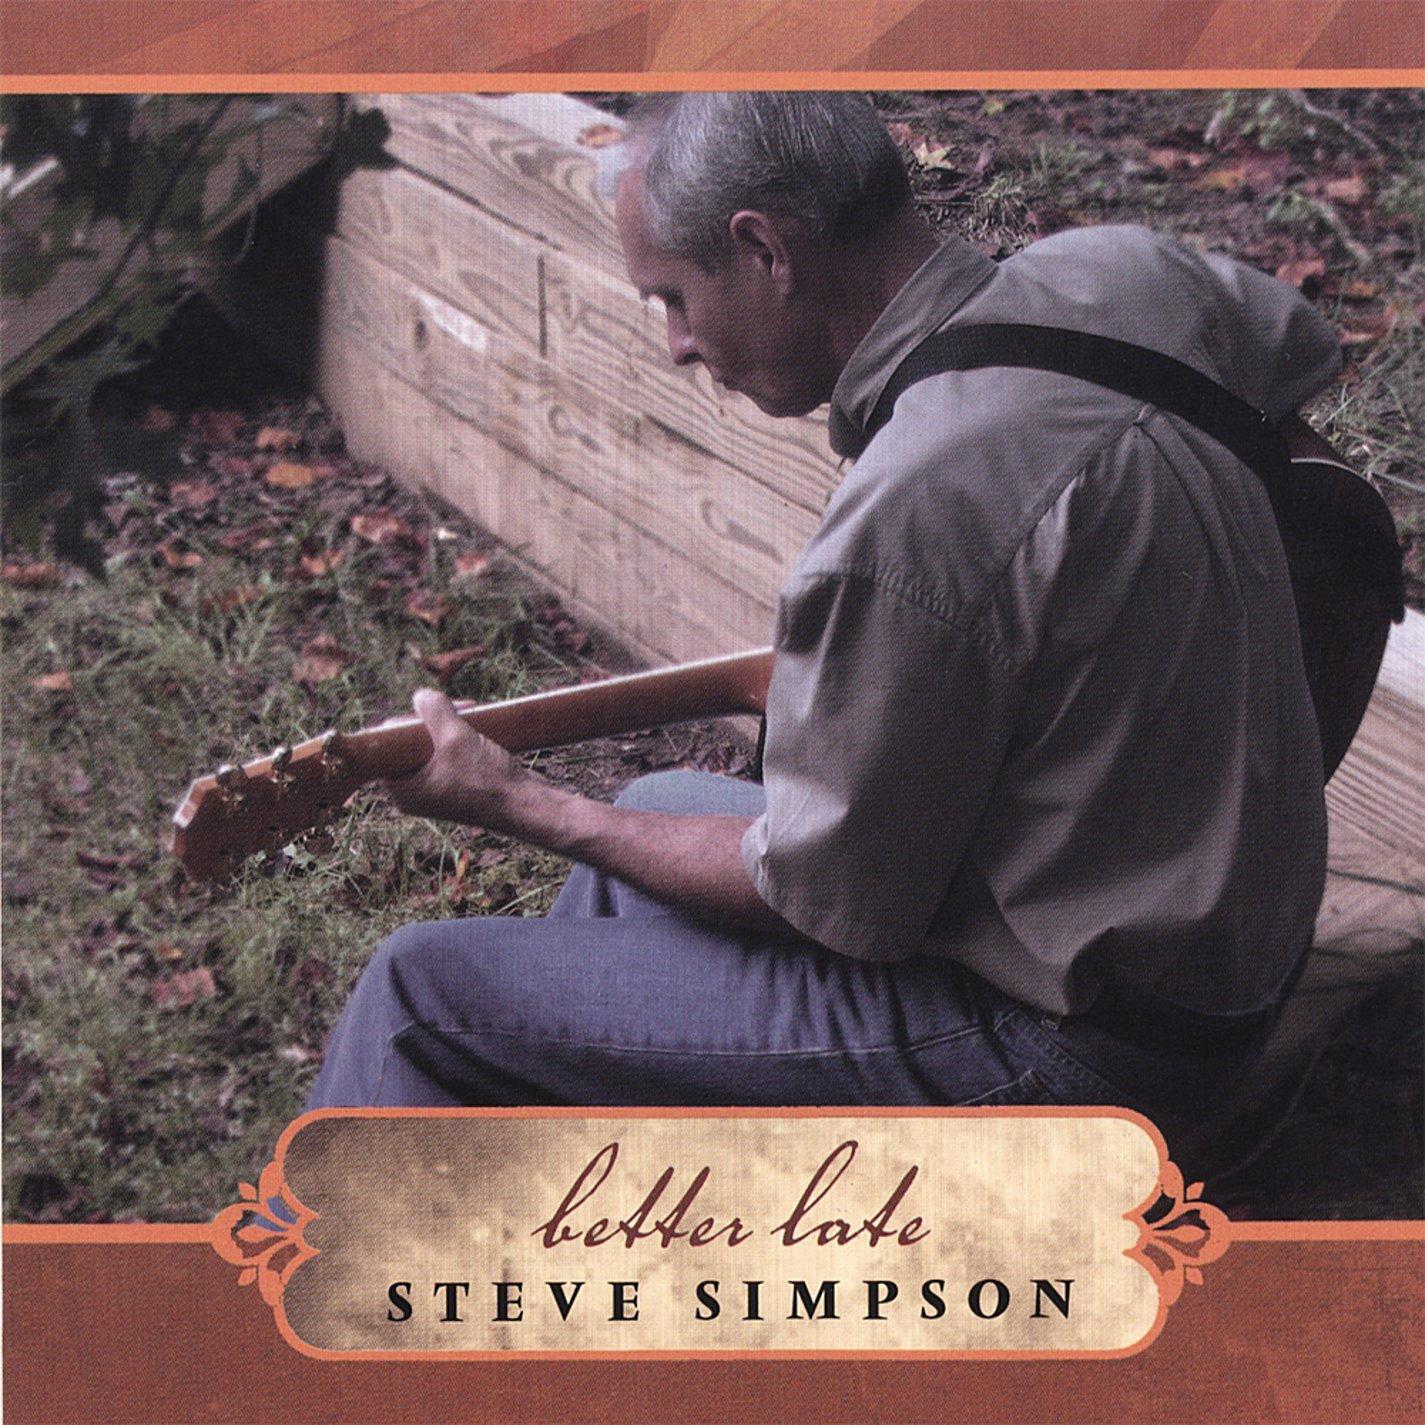 SteveSimpson1.jpg